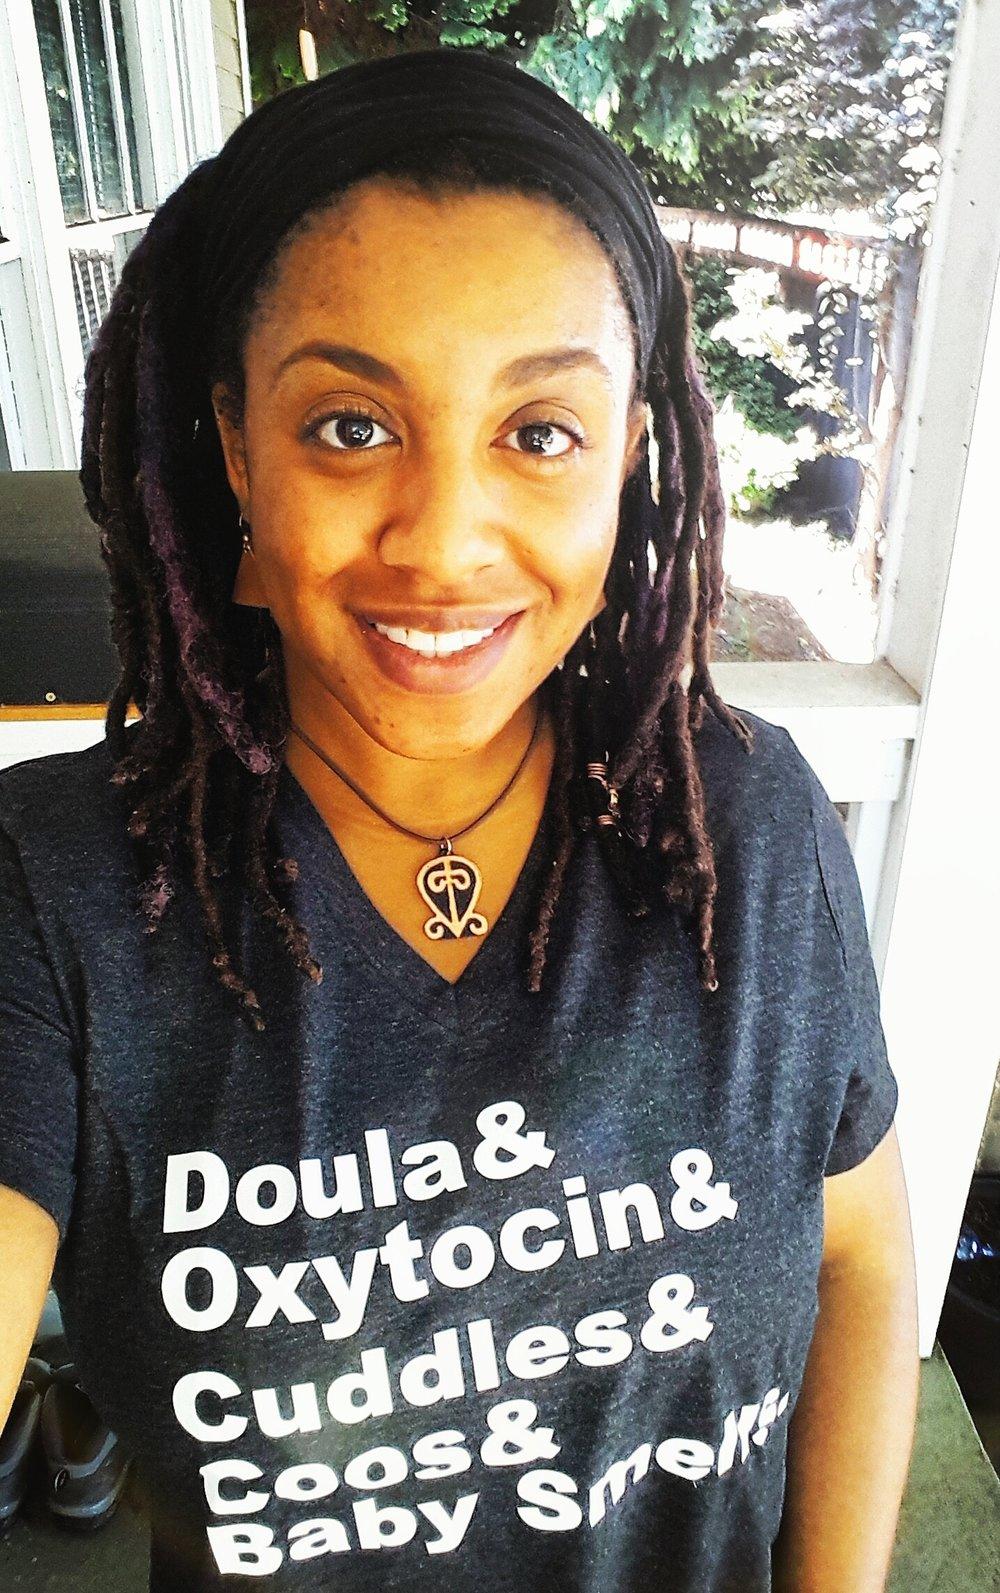 doula-shirt-2.jpg